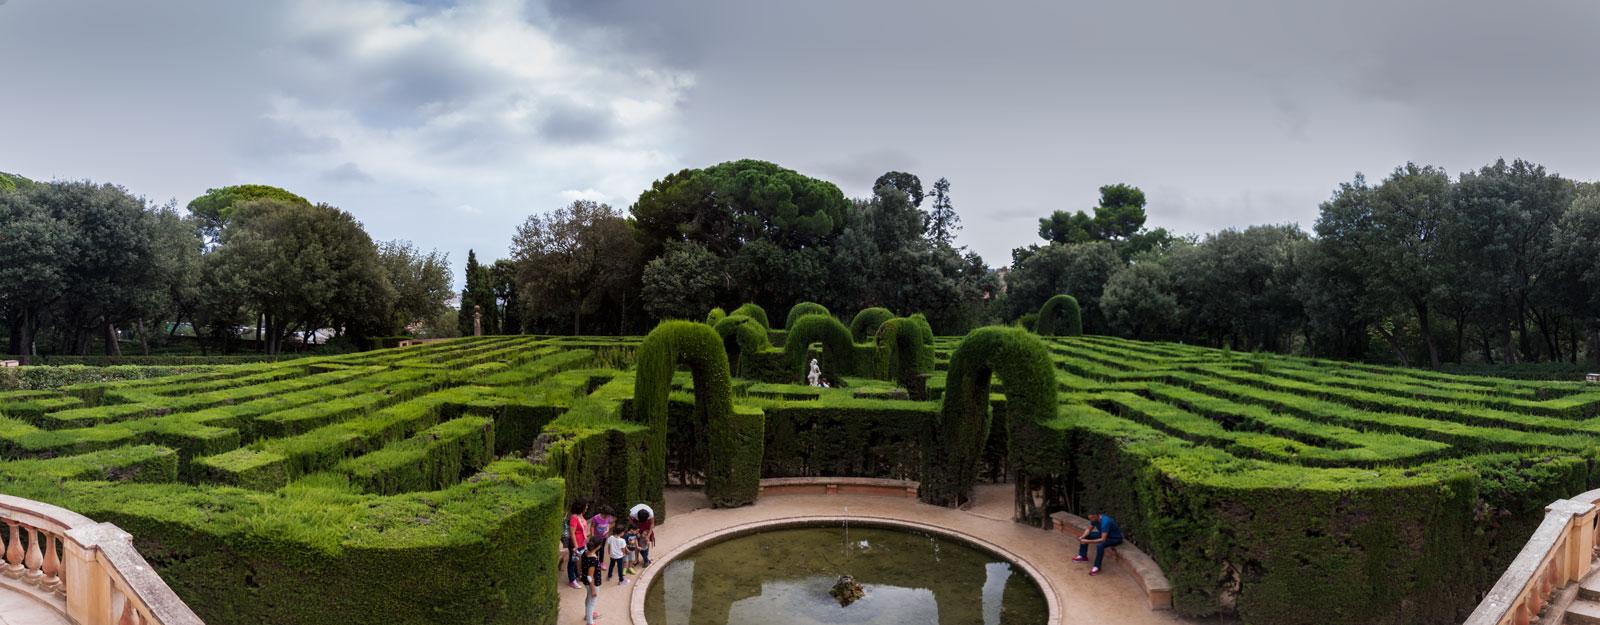 48h Open House Barcelone - Labyrinthe d'Horta